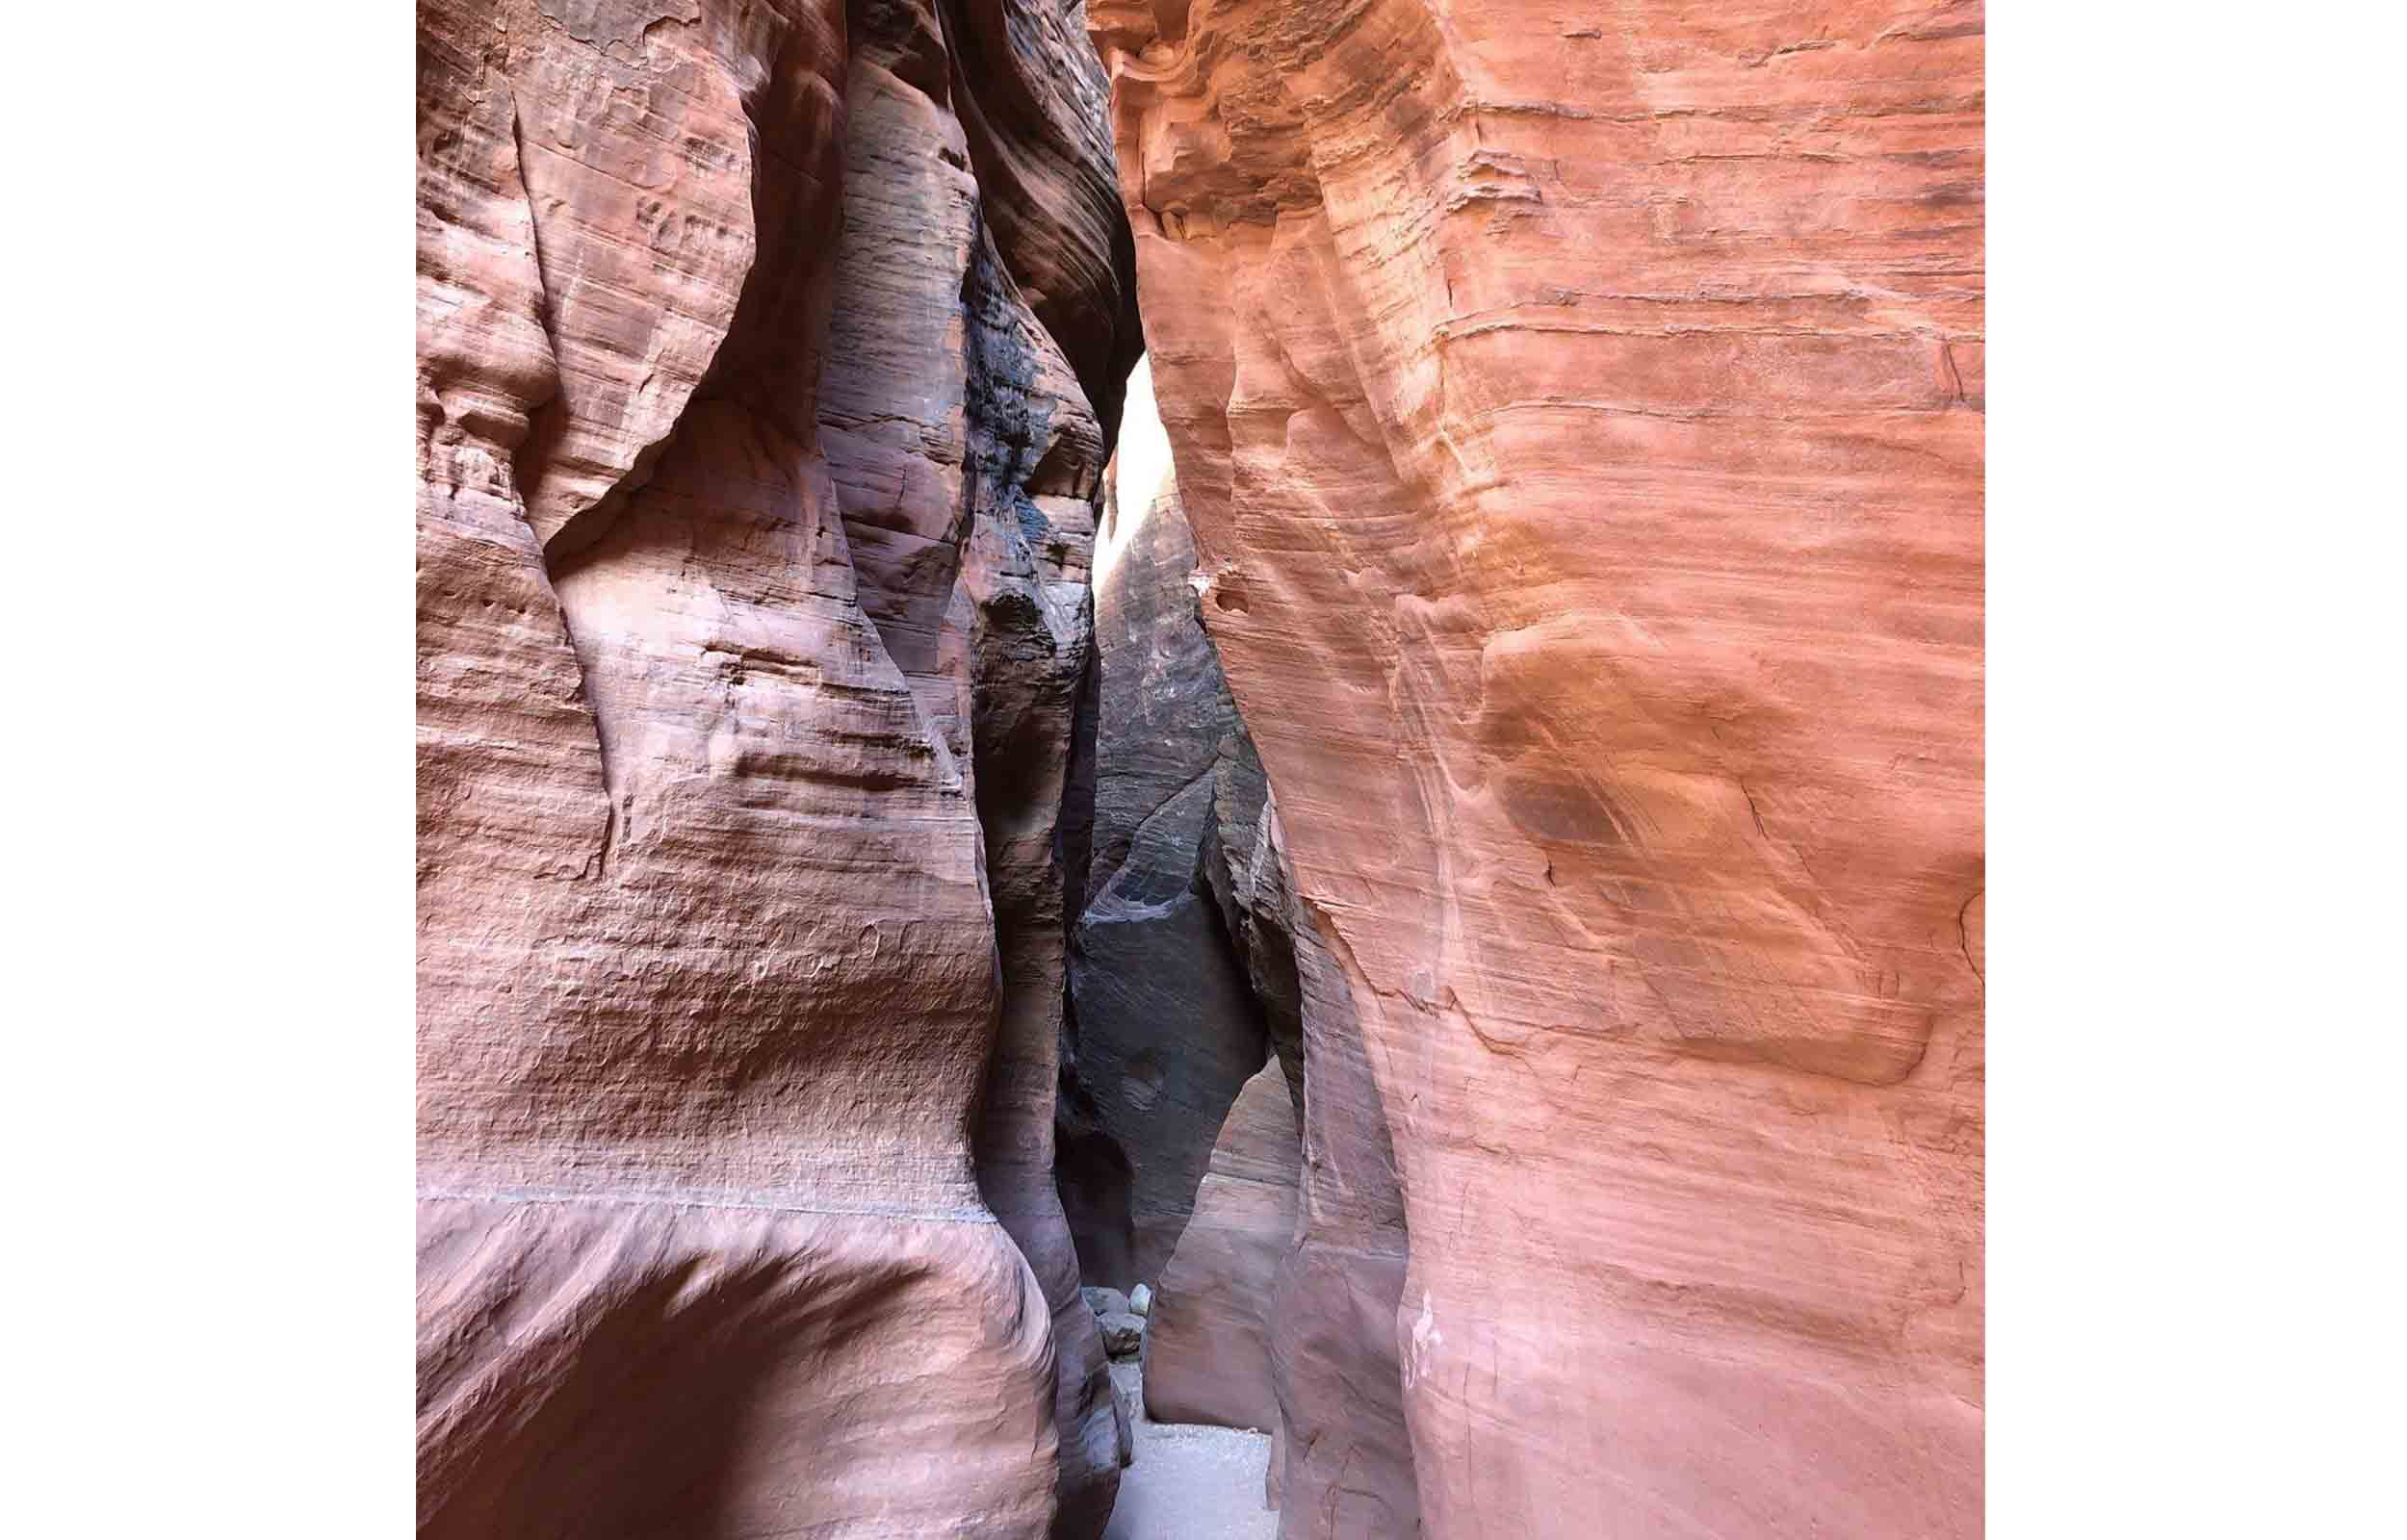 utah hiking canyon slot view of the buckskin gulch wire pass